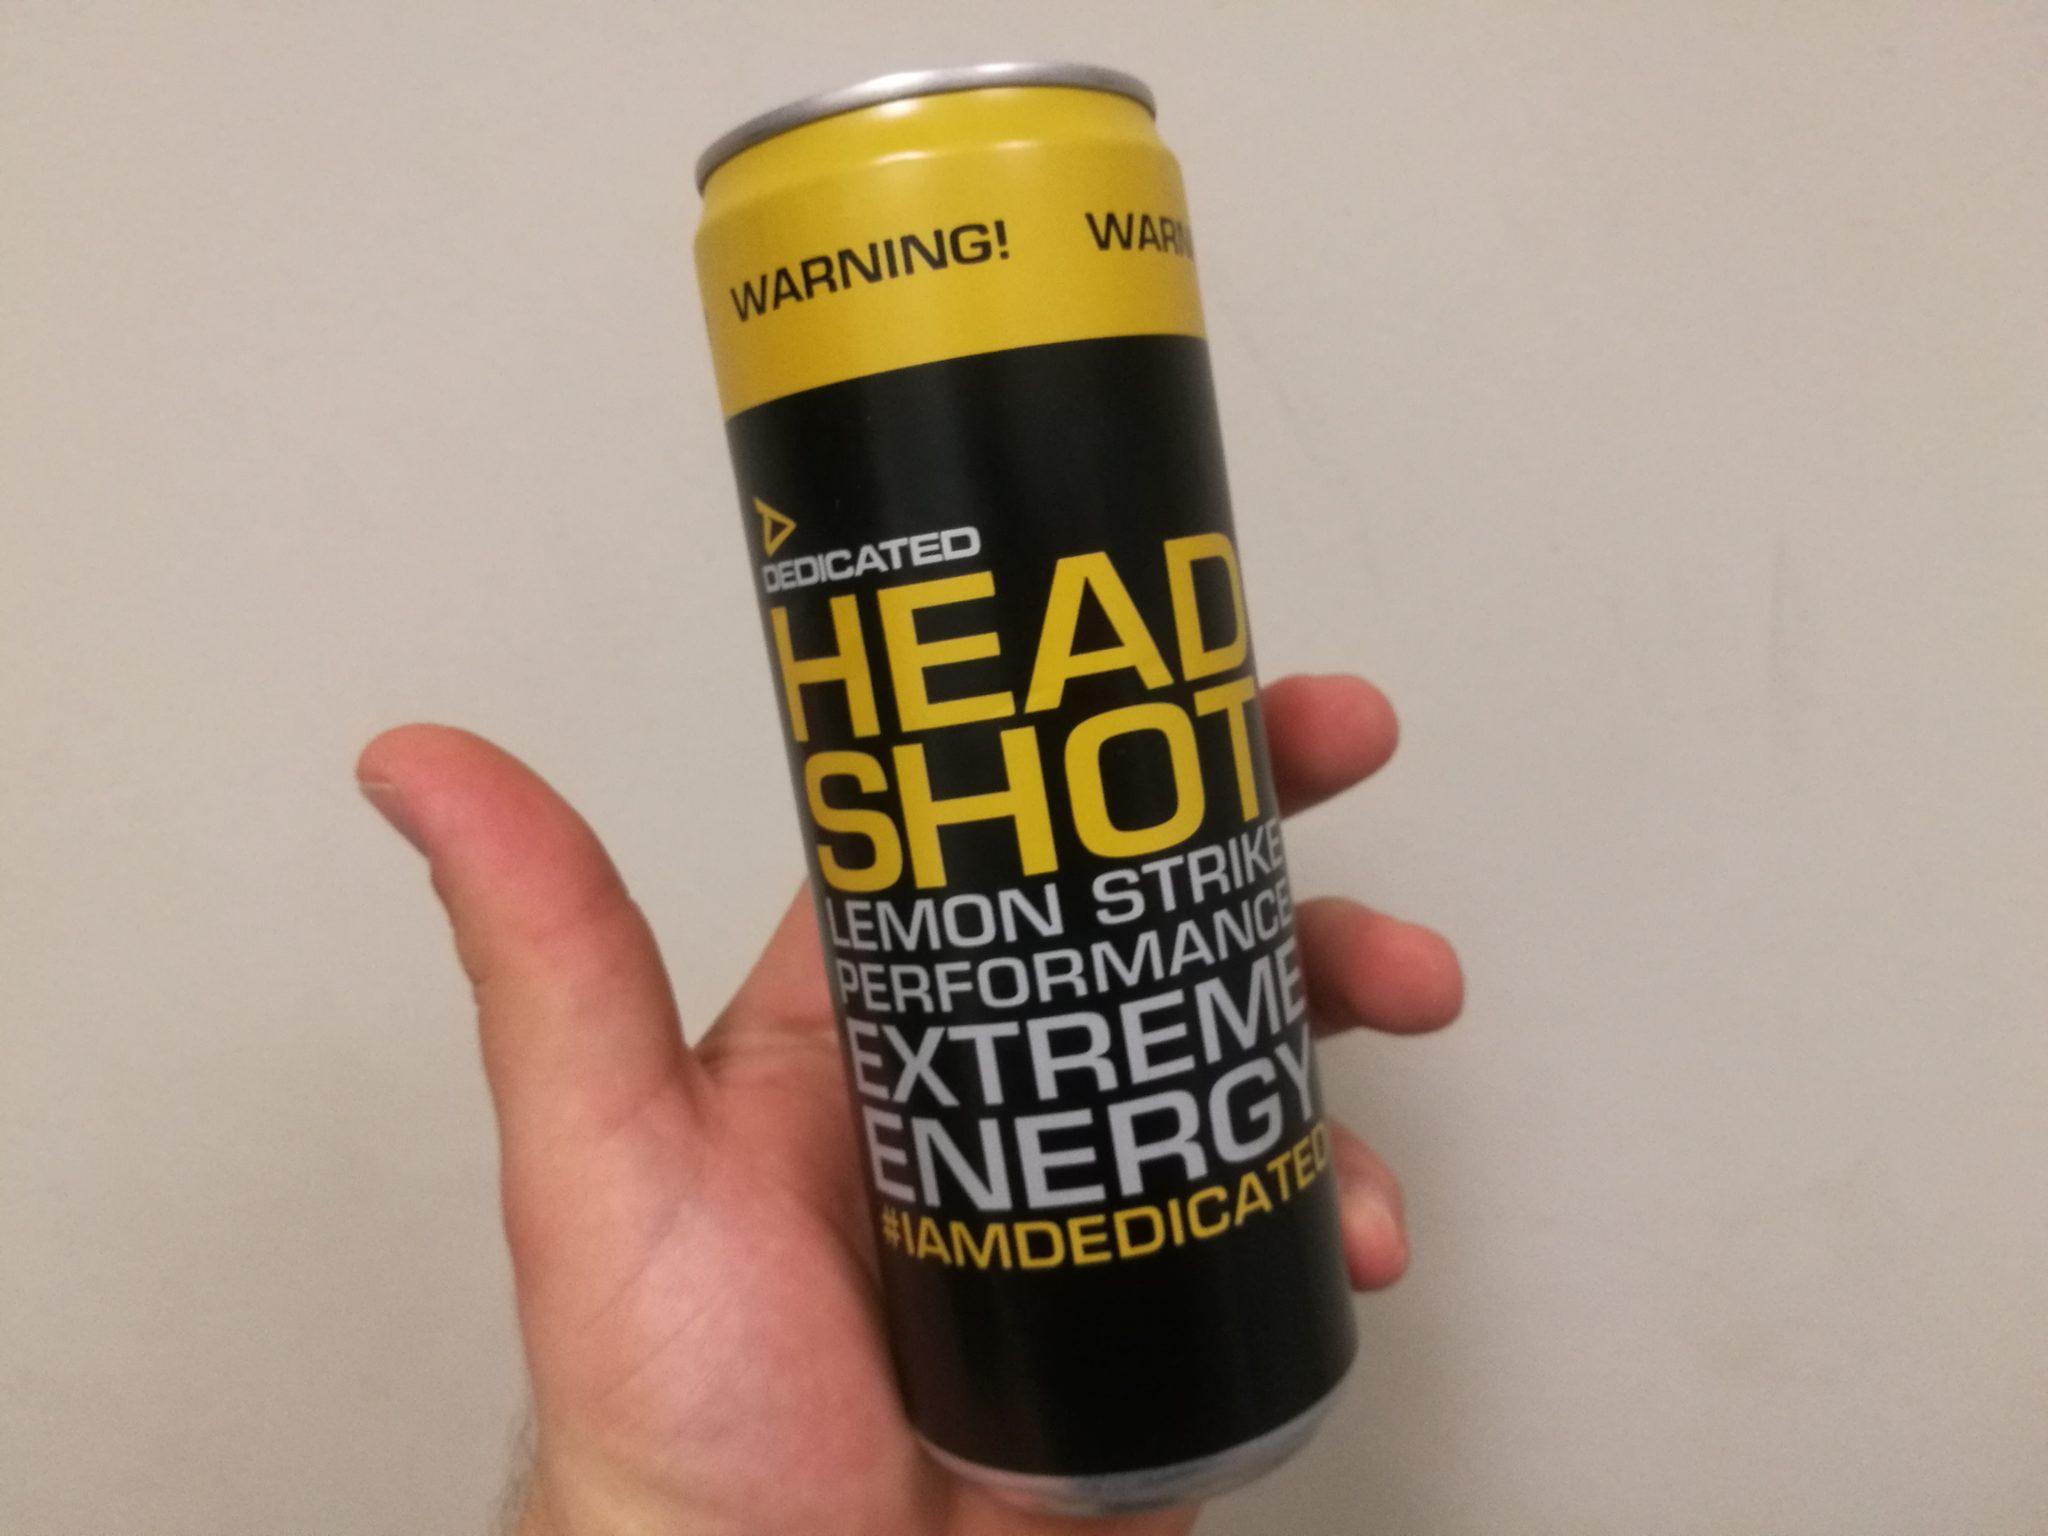 Dedicated Headshot Energy Drink - Produktbewertung / Erfahrung